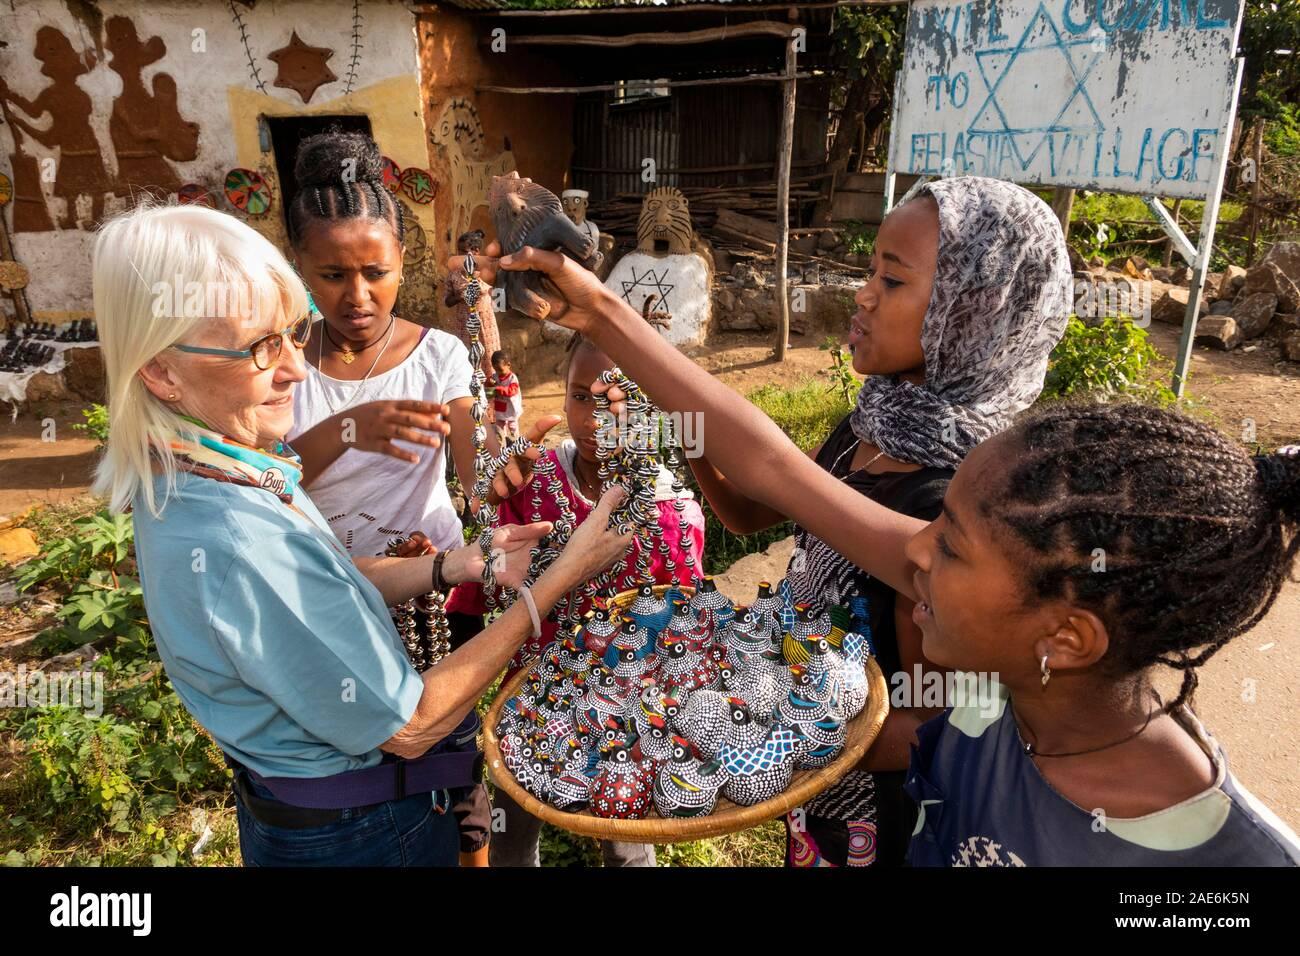 Ethiopia, Amhara Region, Gondar, Wolleka Falasha Jewish Village, children selling souvenirs to senior tourist Stock Photo